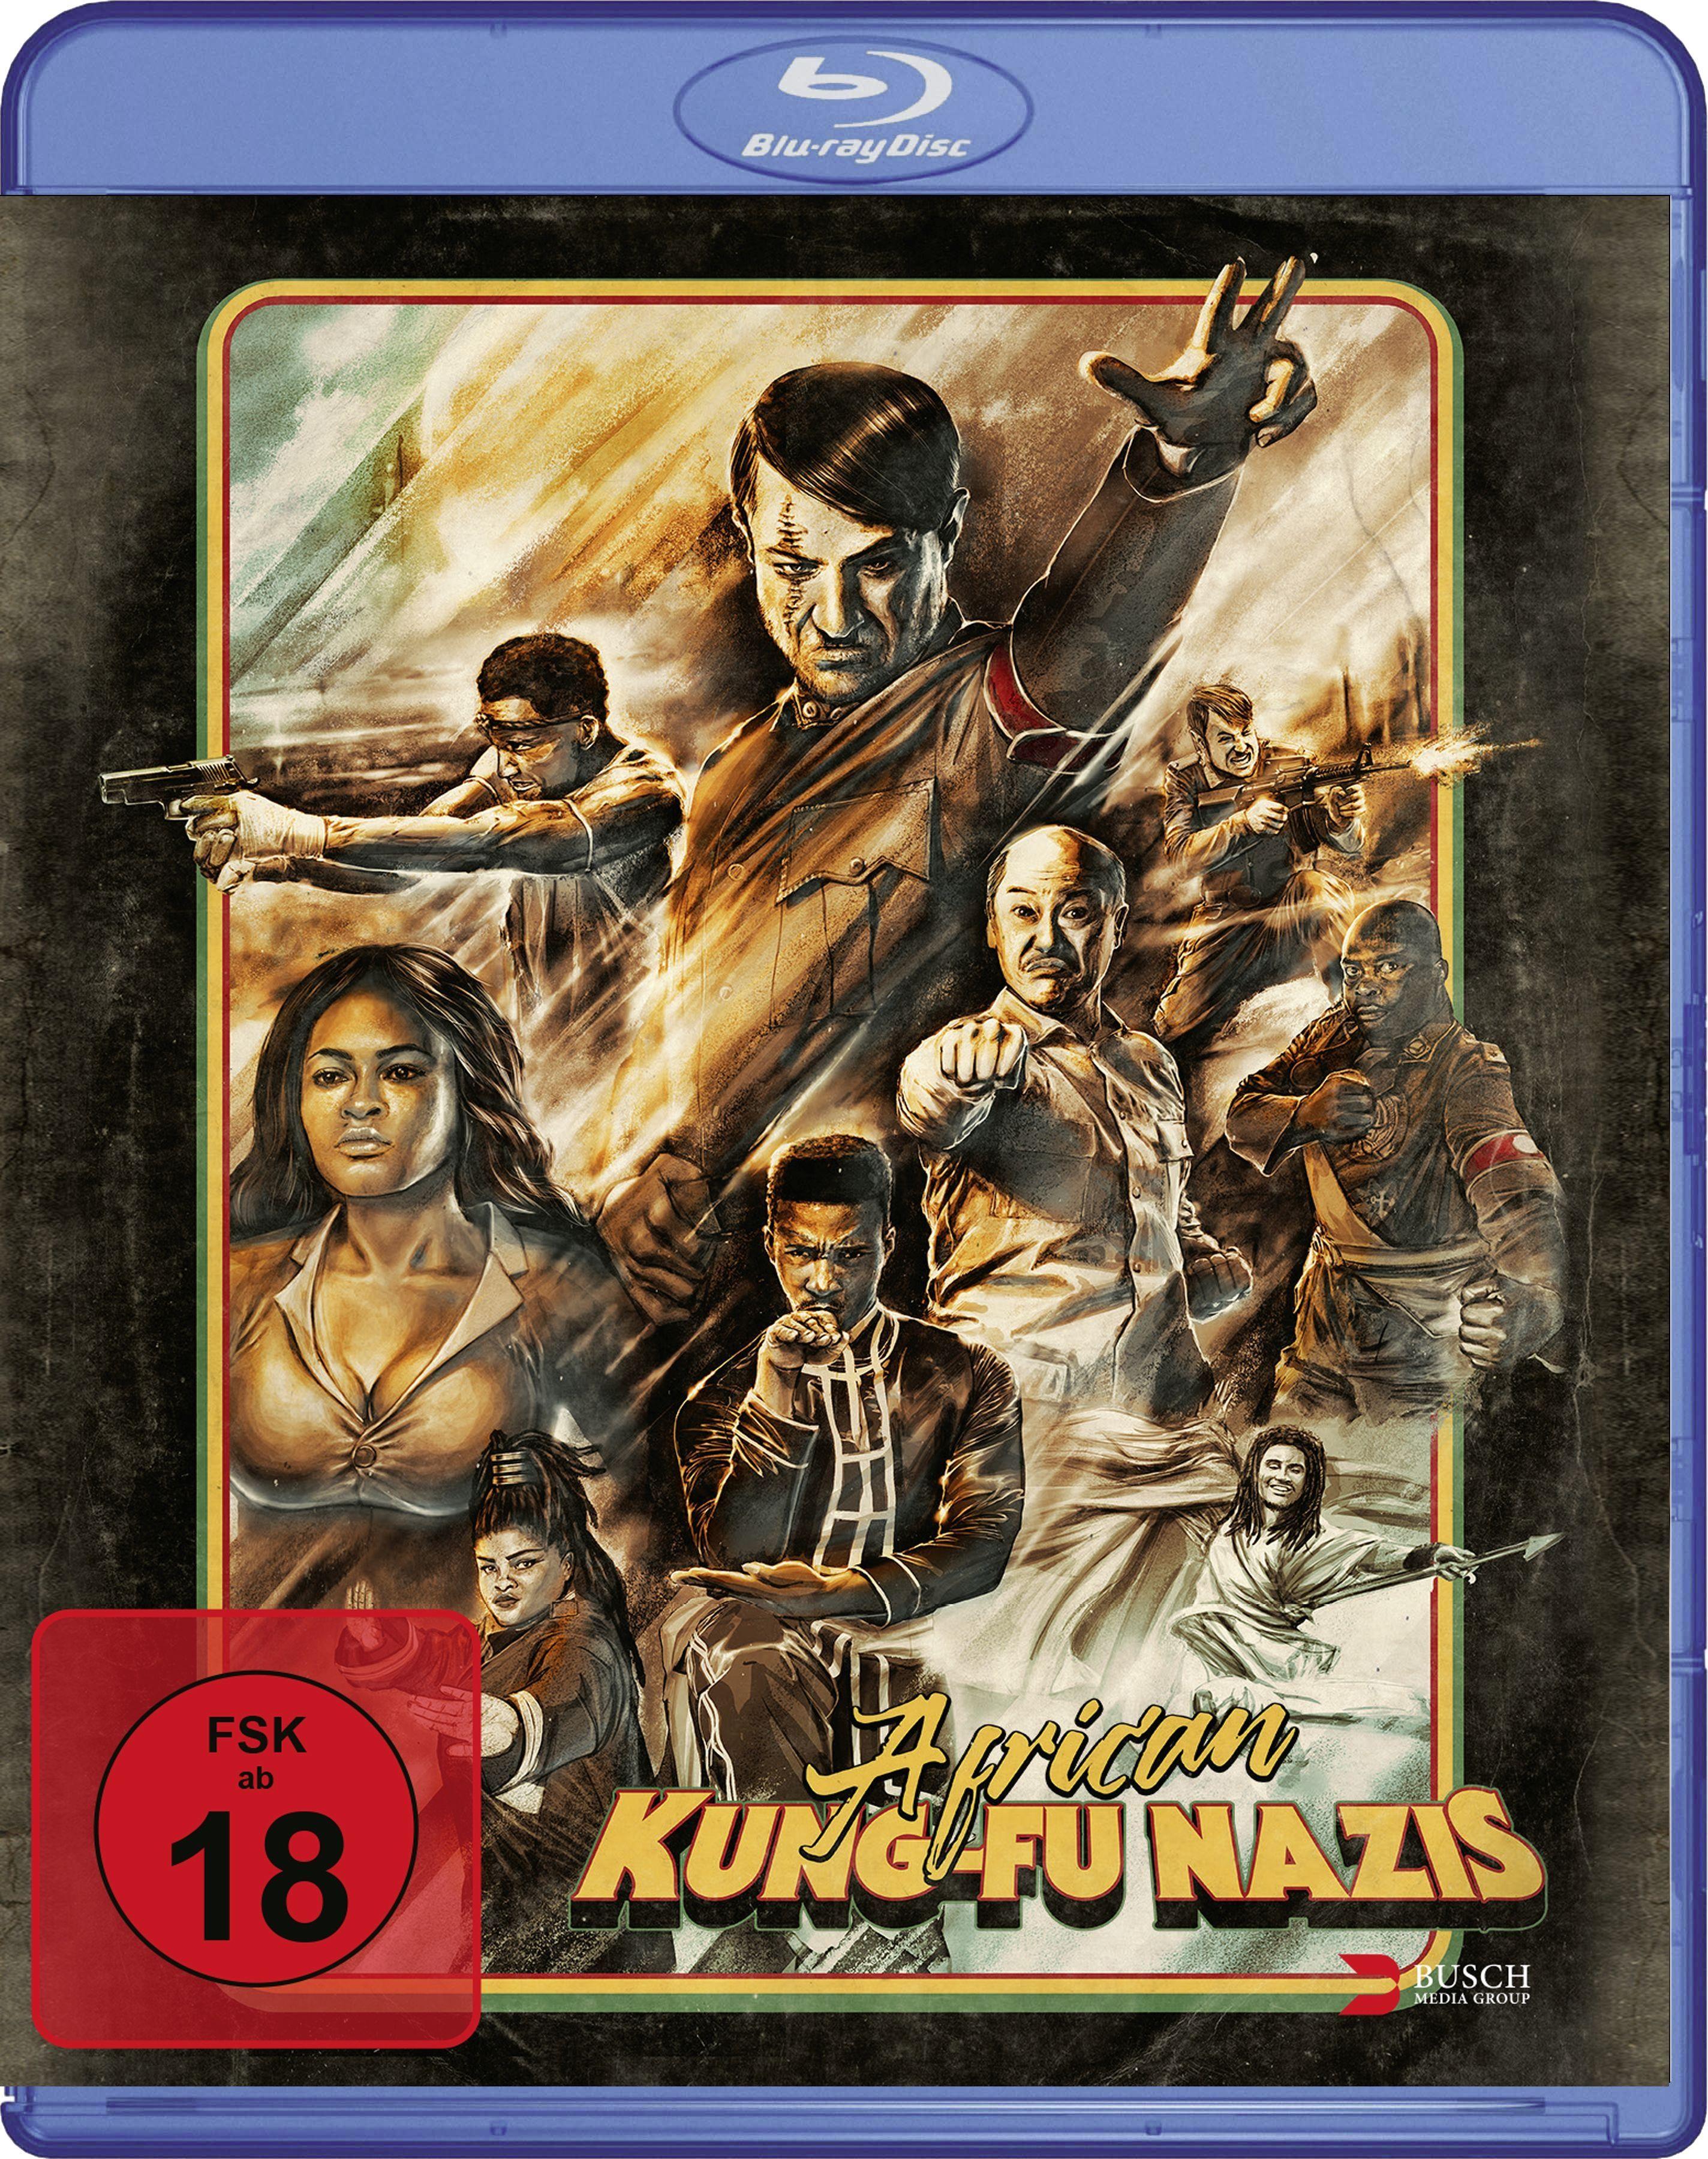 African Kung-Fu Nazis (BLURAY)